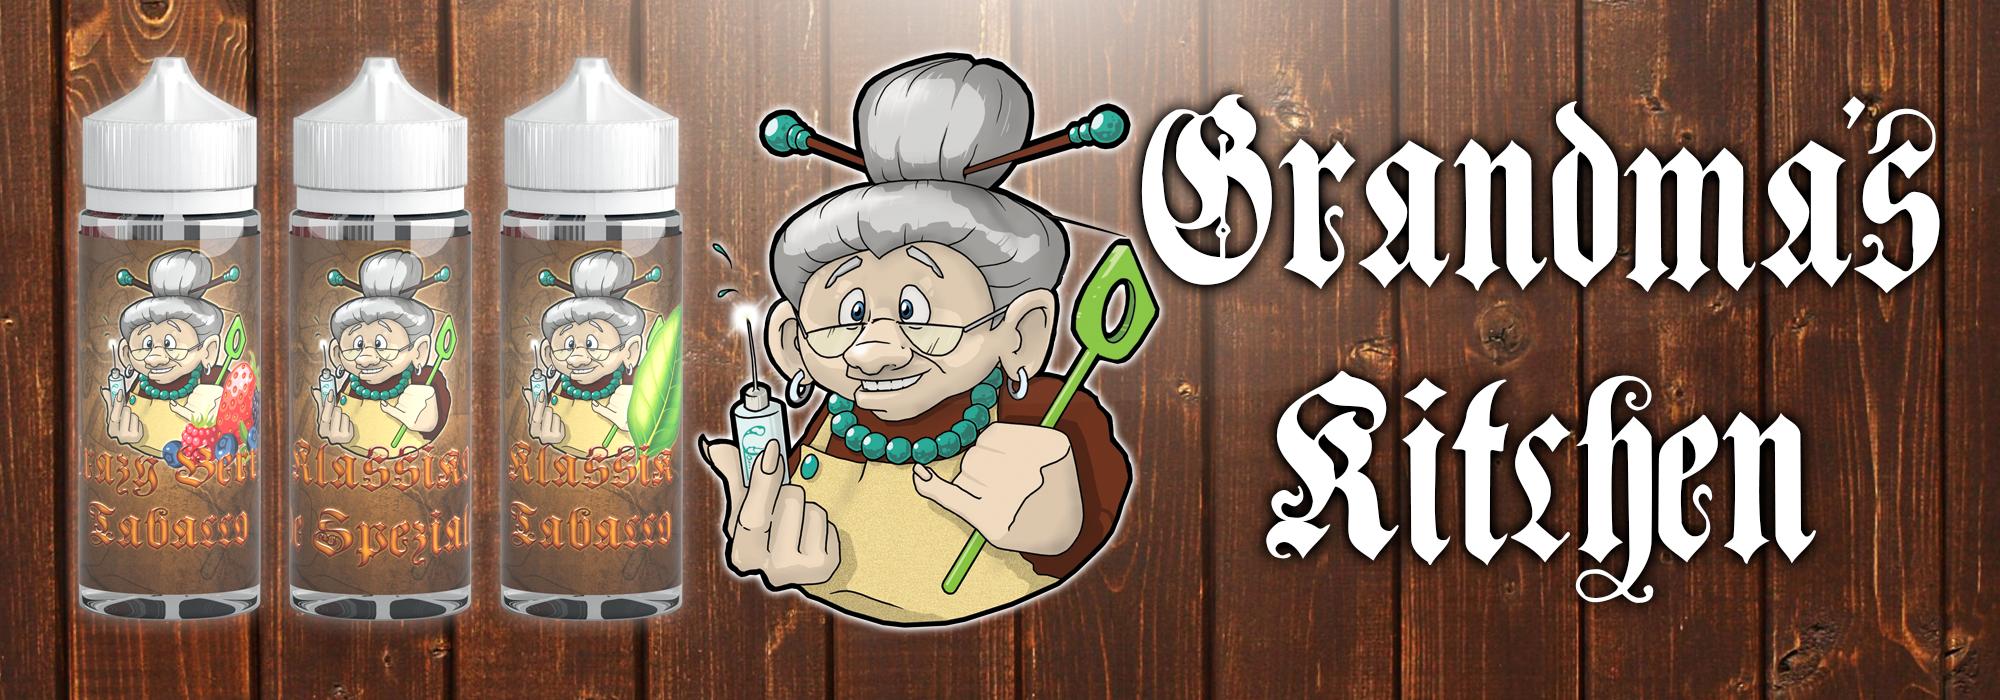 Erste Sahne Grandmas Kitchen Shortfill